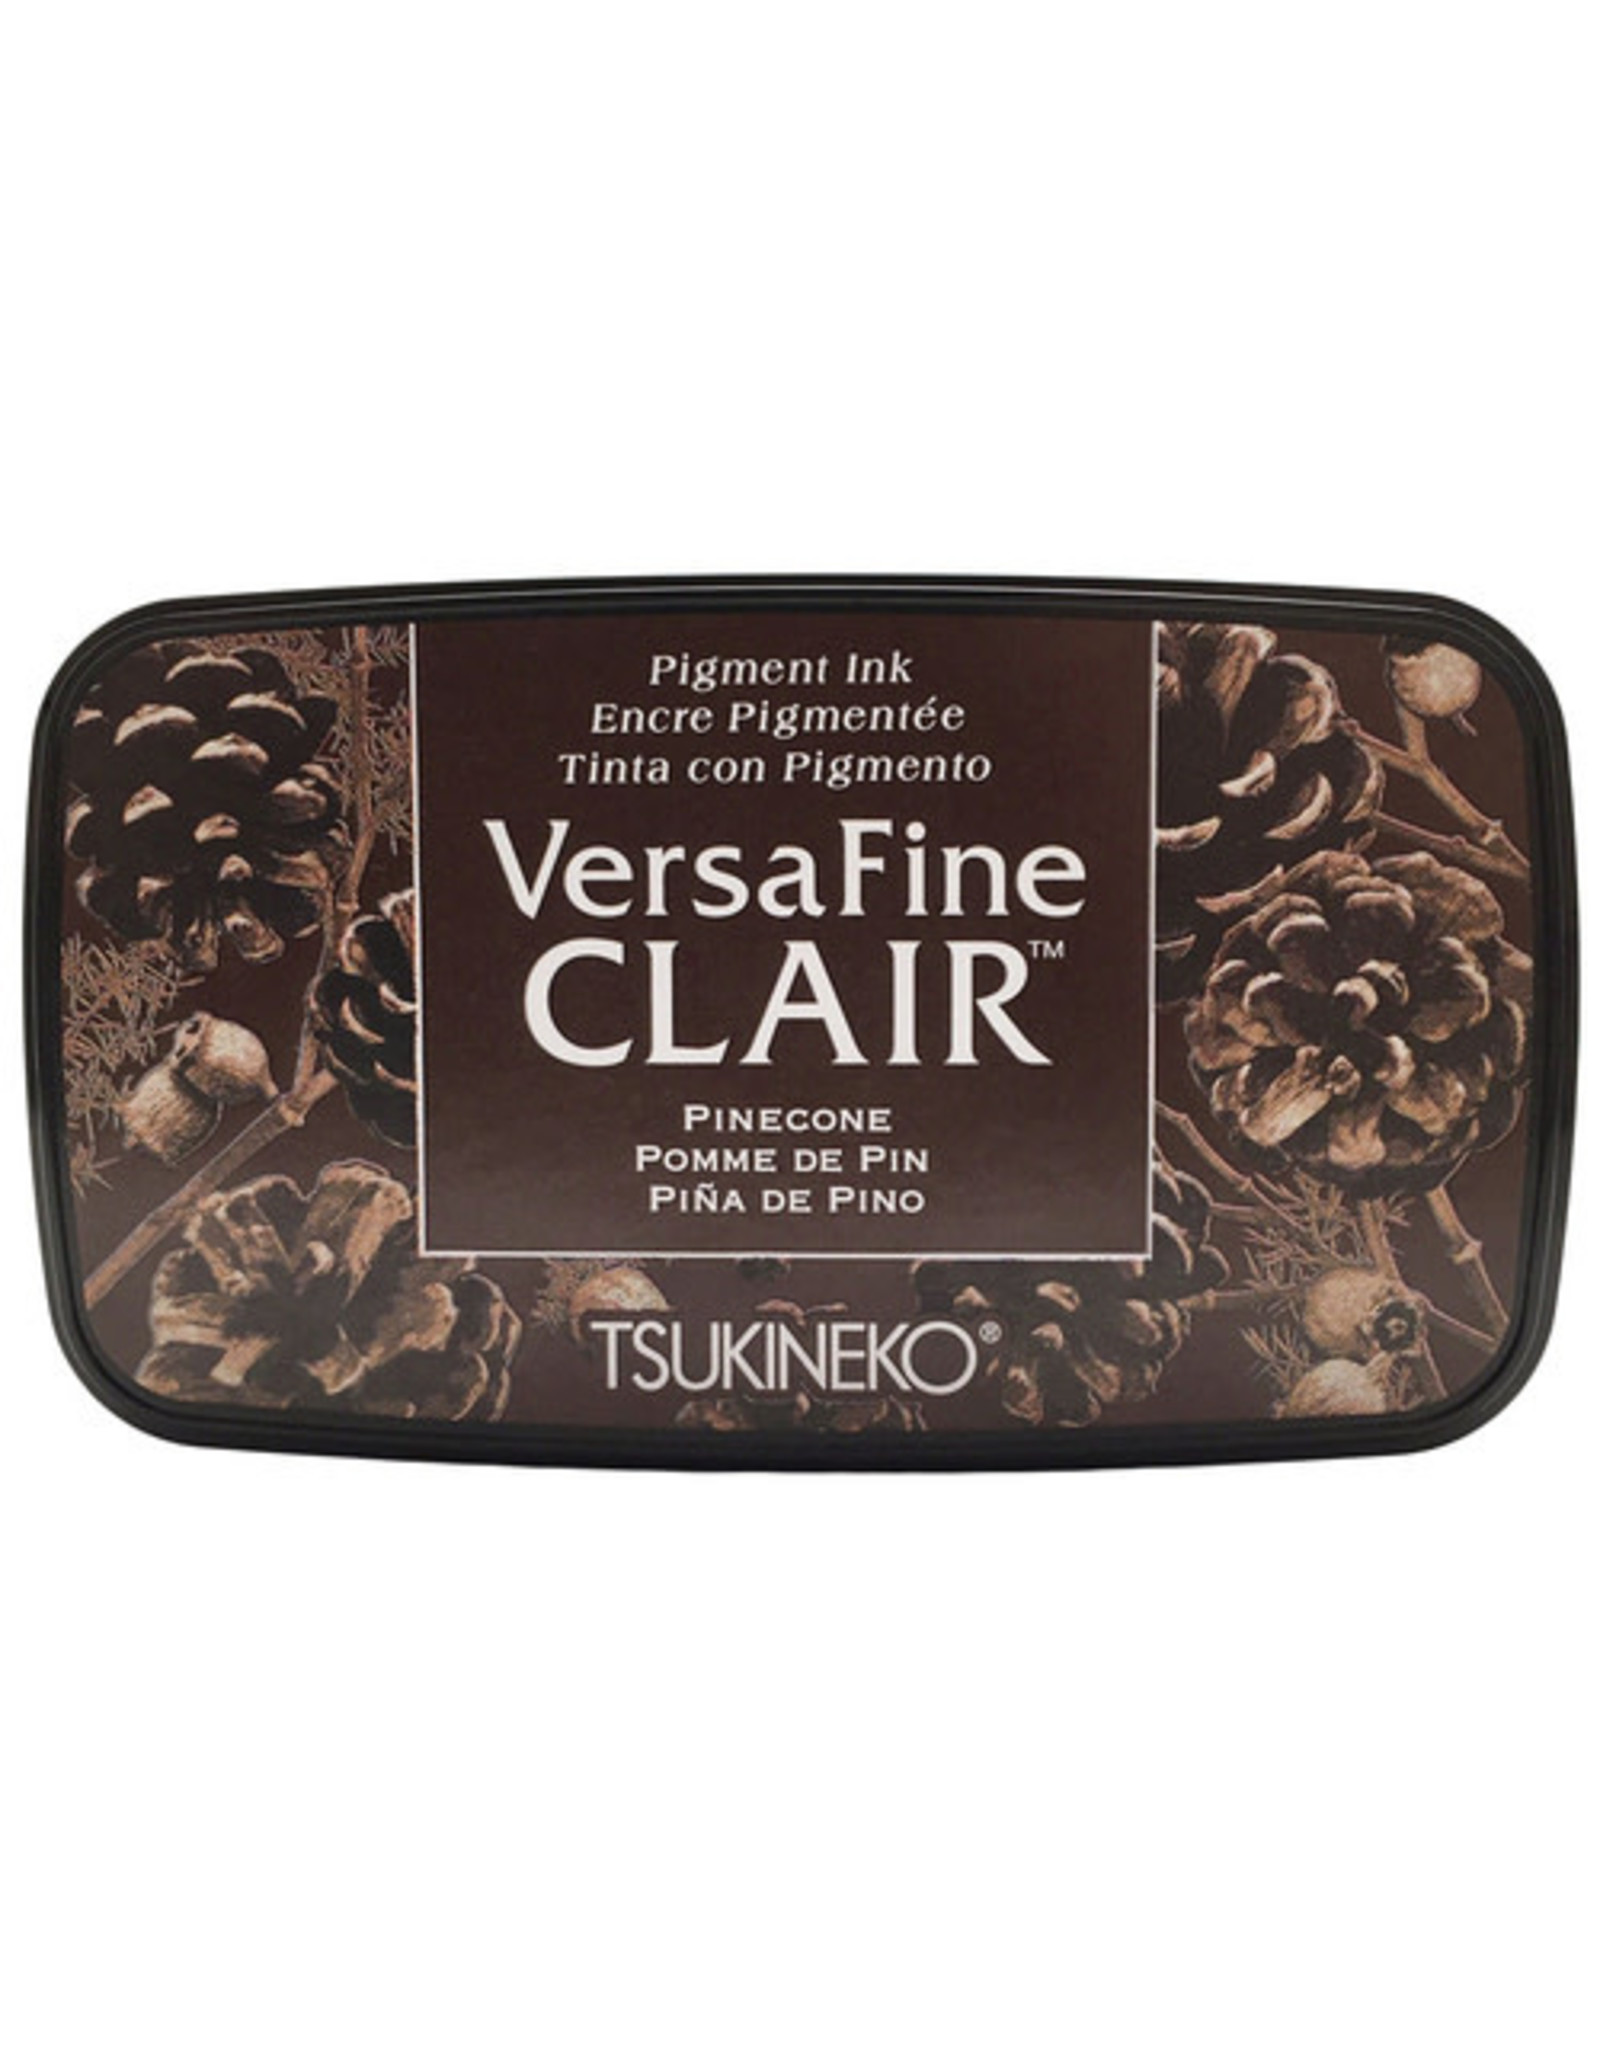 Imagine Crafts VersaFine Clair Ink Pad - Pinecone